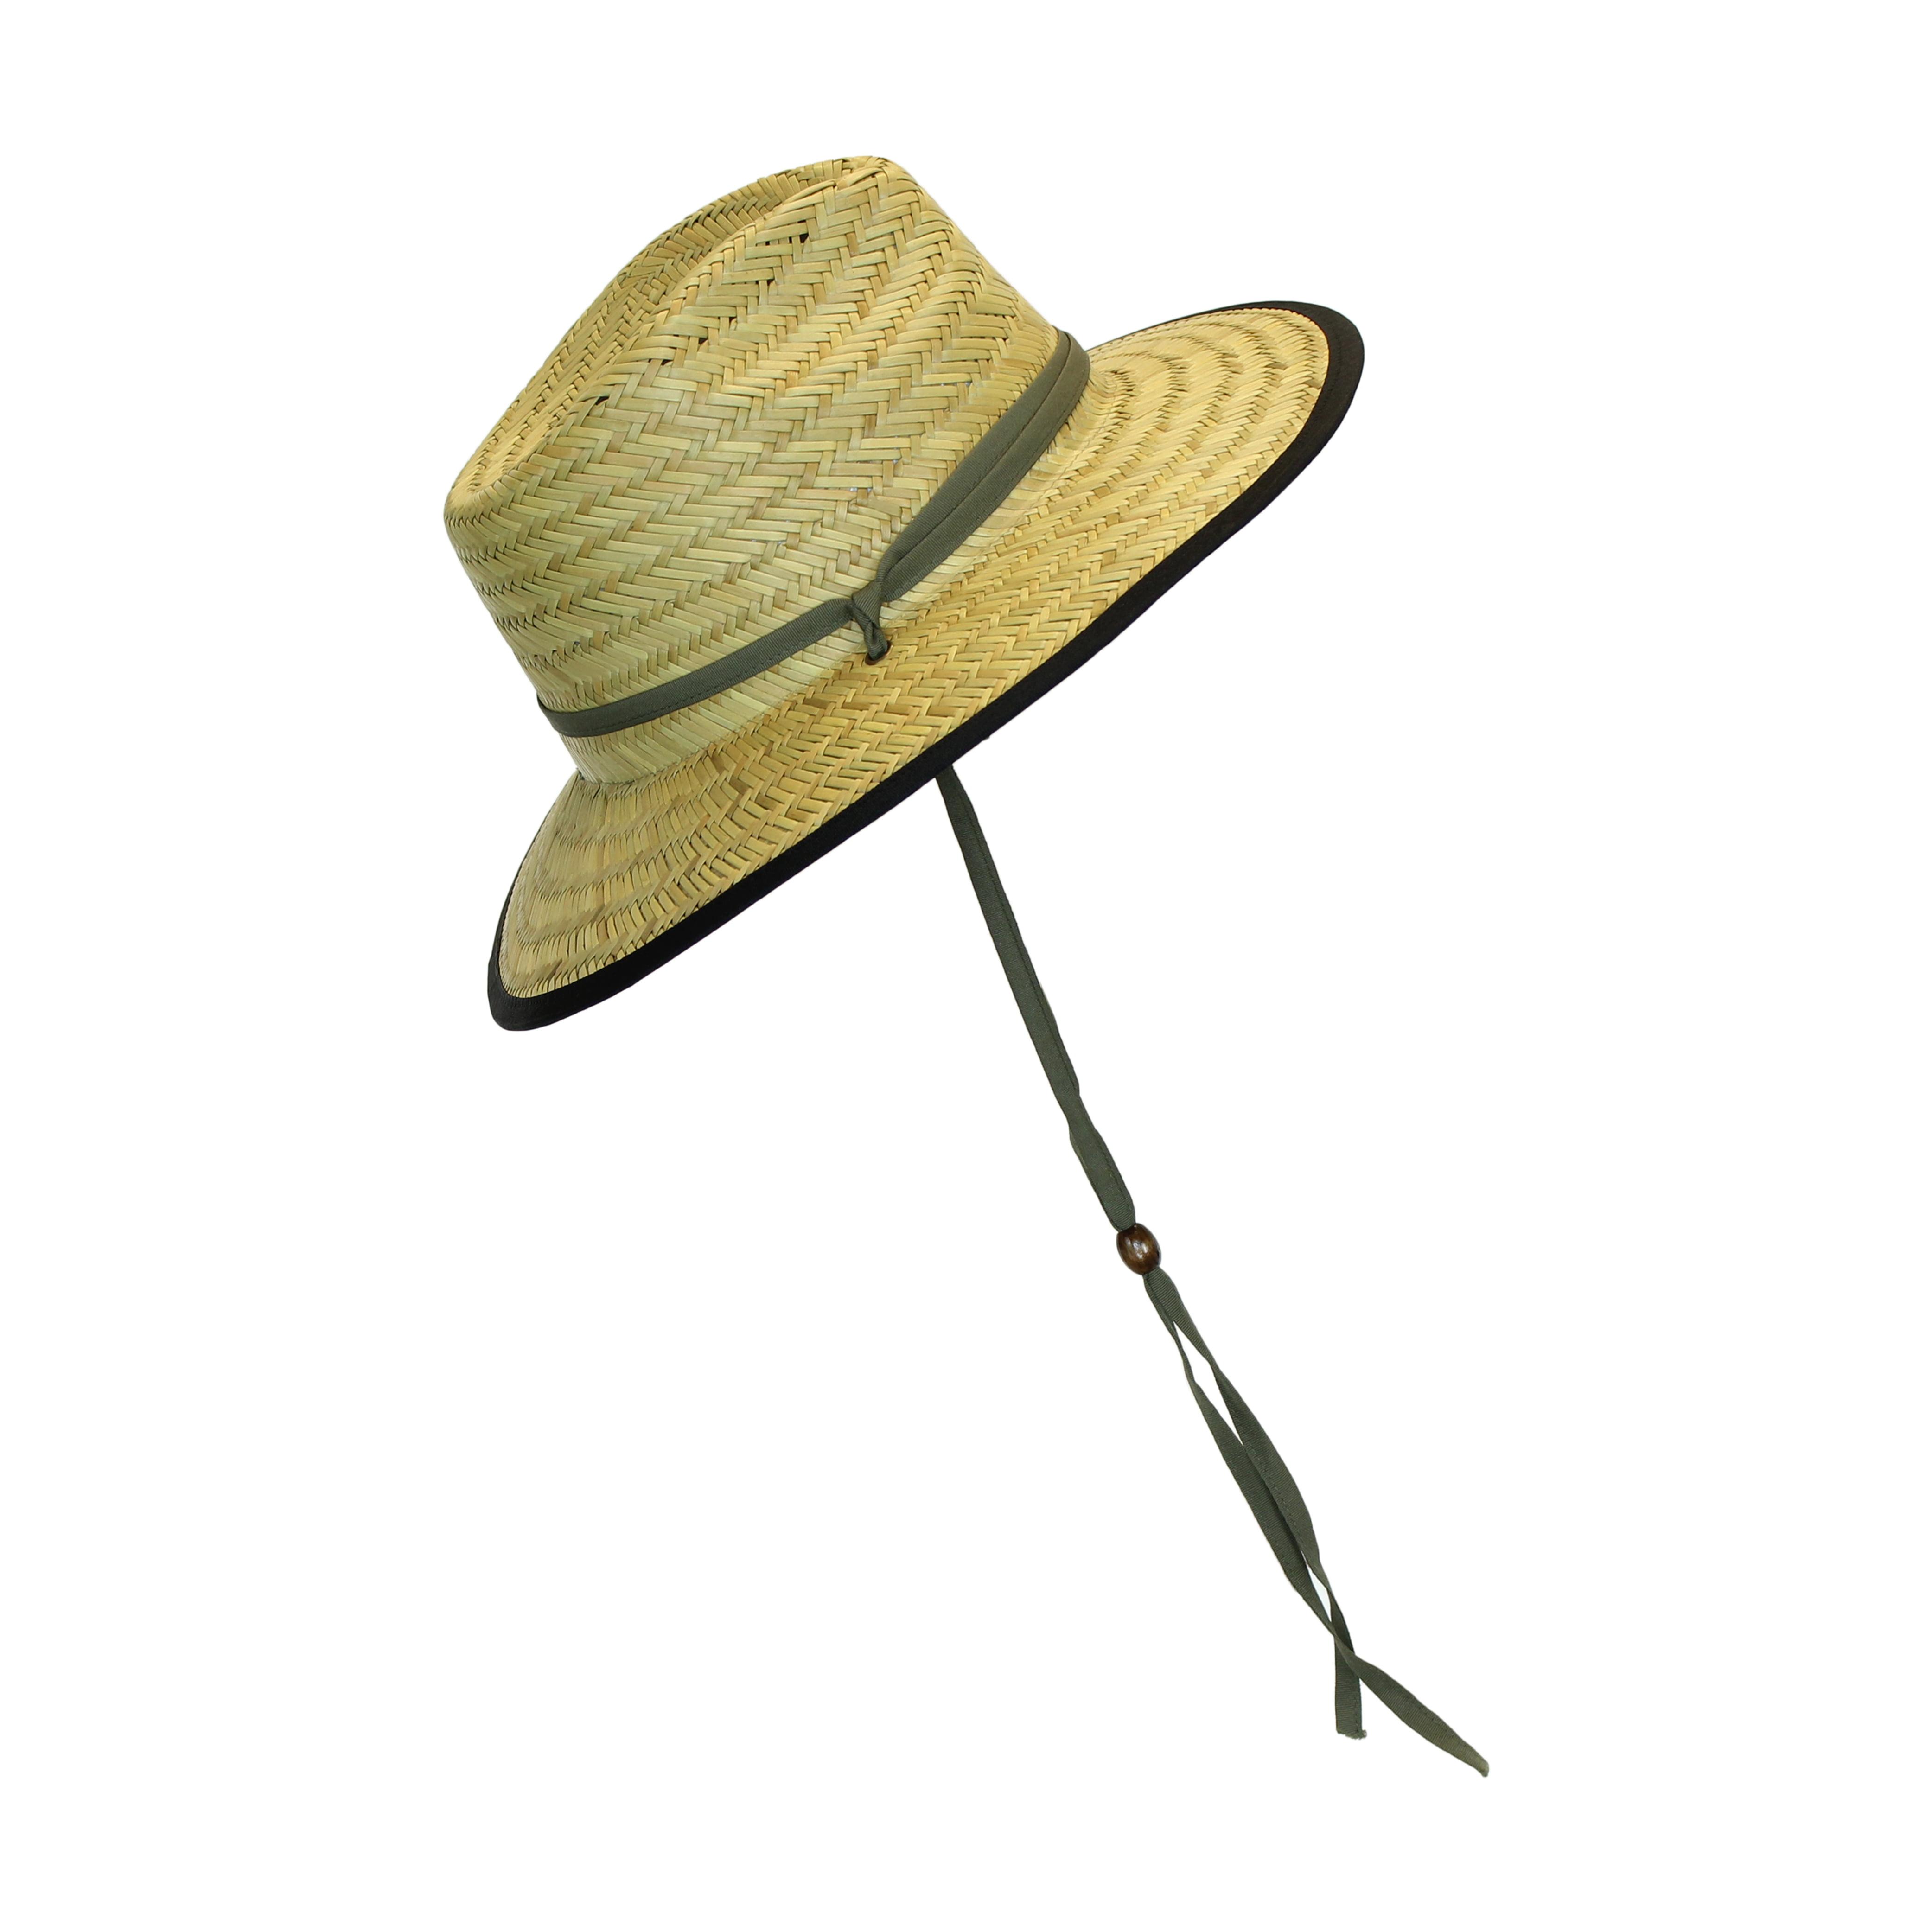 55eb8a8612fd9 Dorfman Pacific Black Trim Wide Brim Natural Straw Lifeguard Outback Sun Hat  w  Chin Strap - Walmart.com